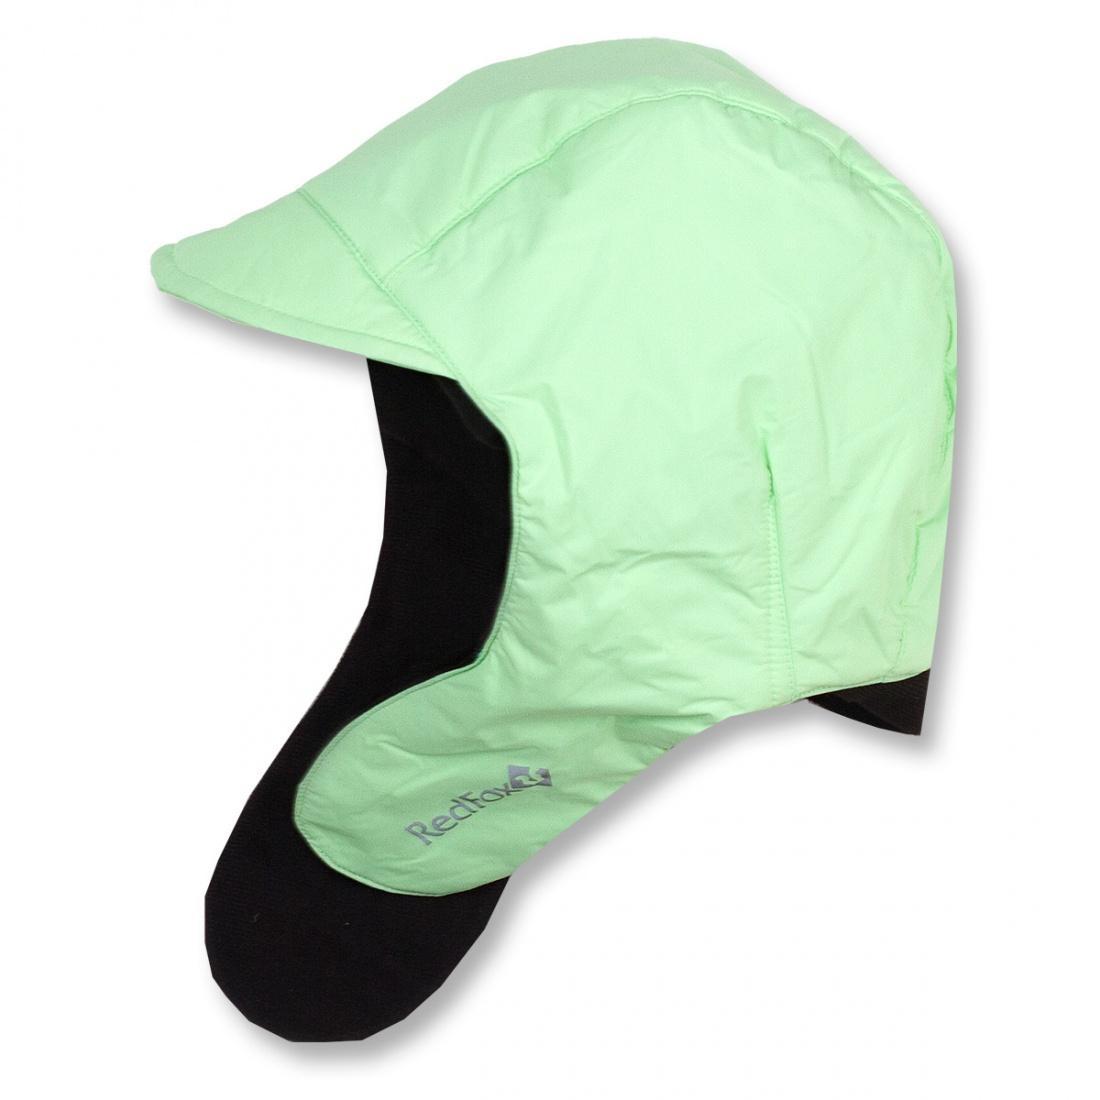 Шапка детская PilotУшанки<br><br> Удобная стильная шапочка для детей от года. <br><br> <br><br><br><br> Материал – Dry Factor 1000.<br><br> <br><br><br> Утеплитель – Omniterm Classic.<br><br> <br>&lt;...<br><br>Цвет: Светло-зеленый<br>Размер: XL